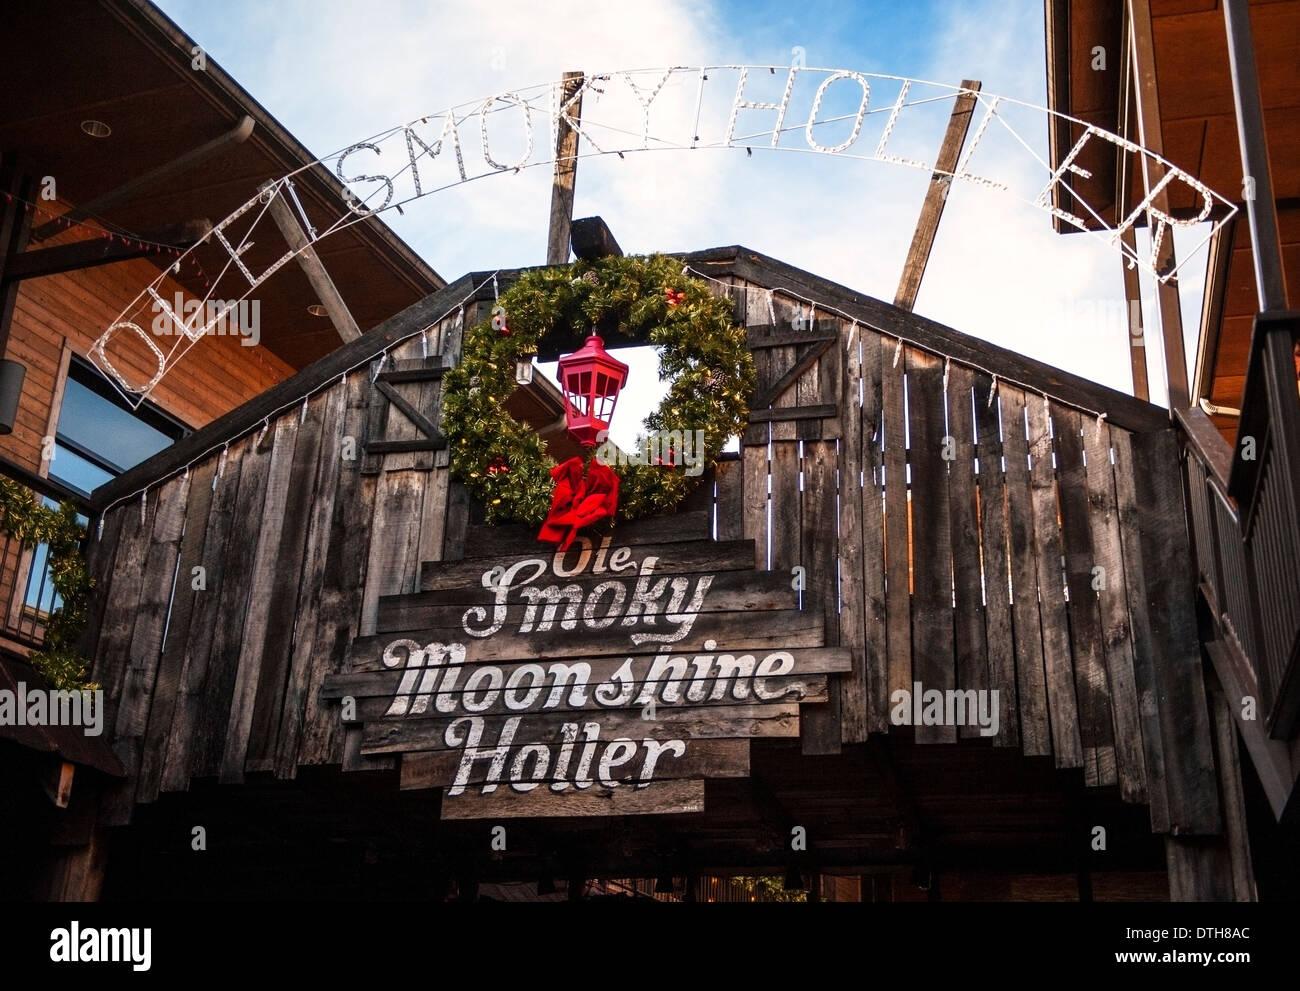 Ole Smoky Moonshine Holler in Gatlinburg Tennessee - Stock Image